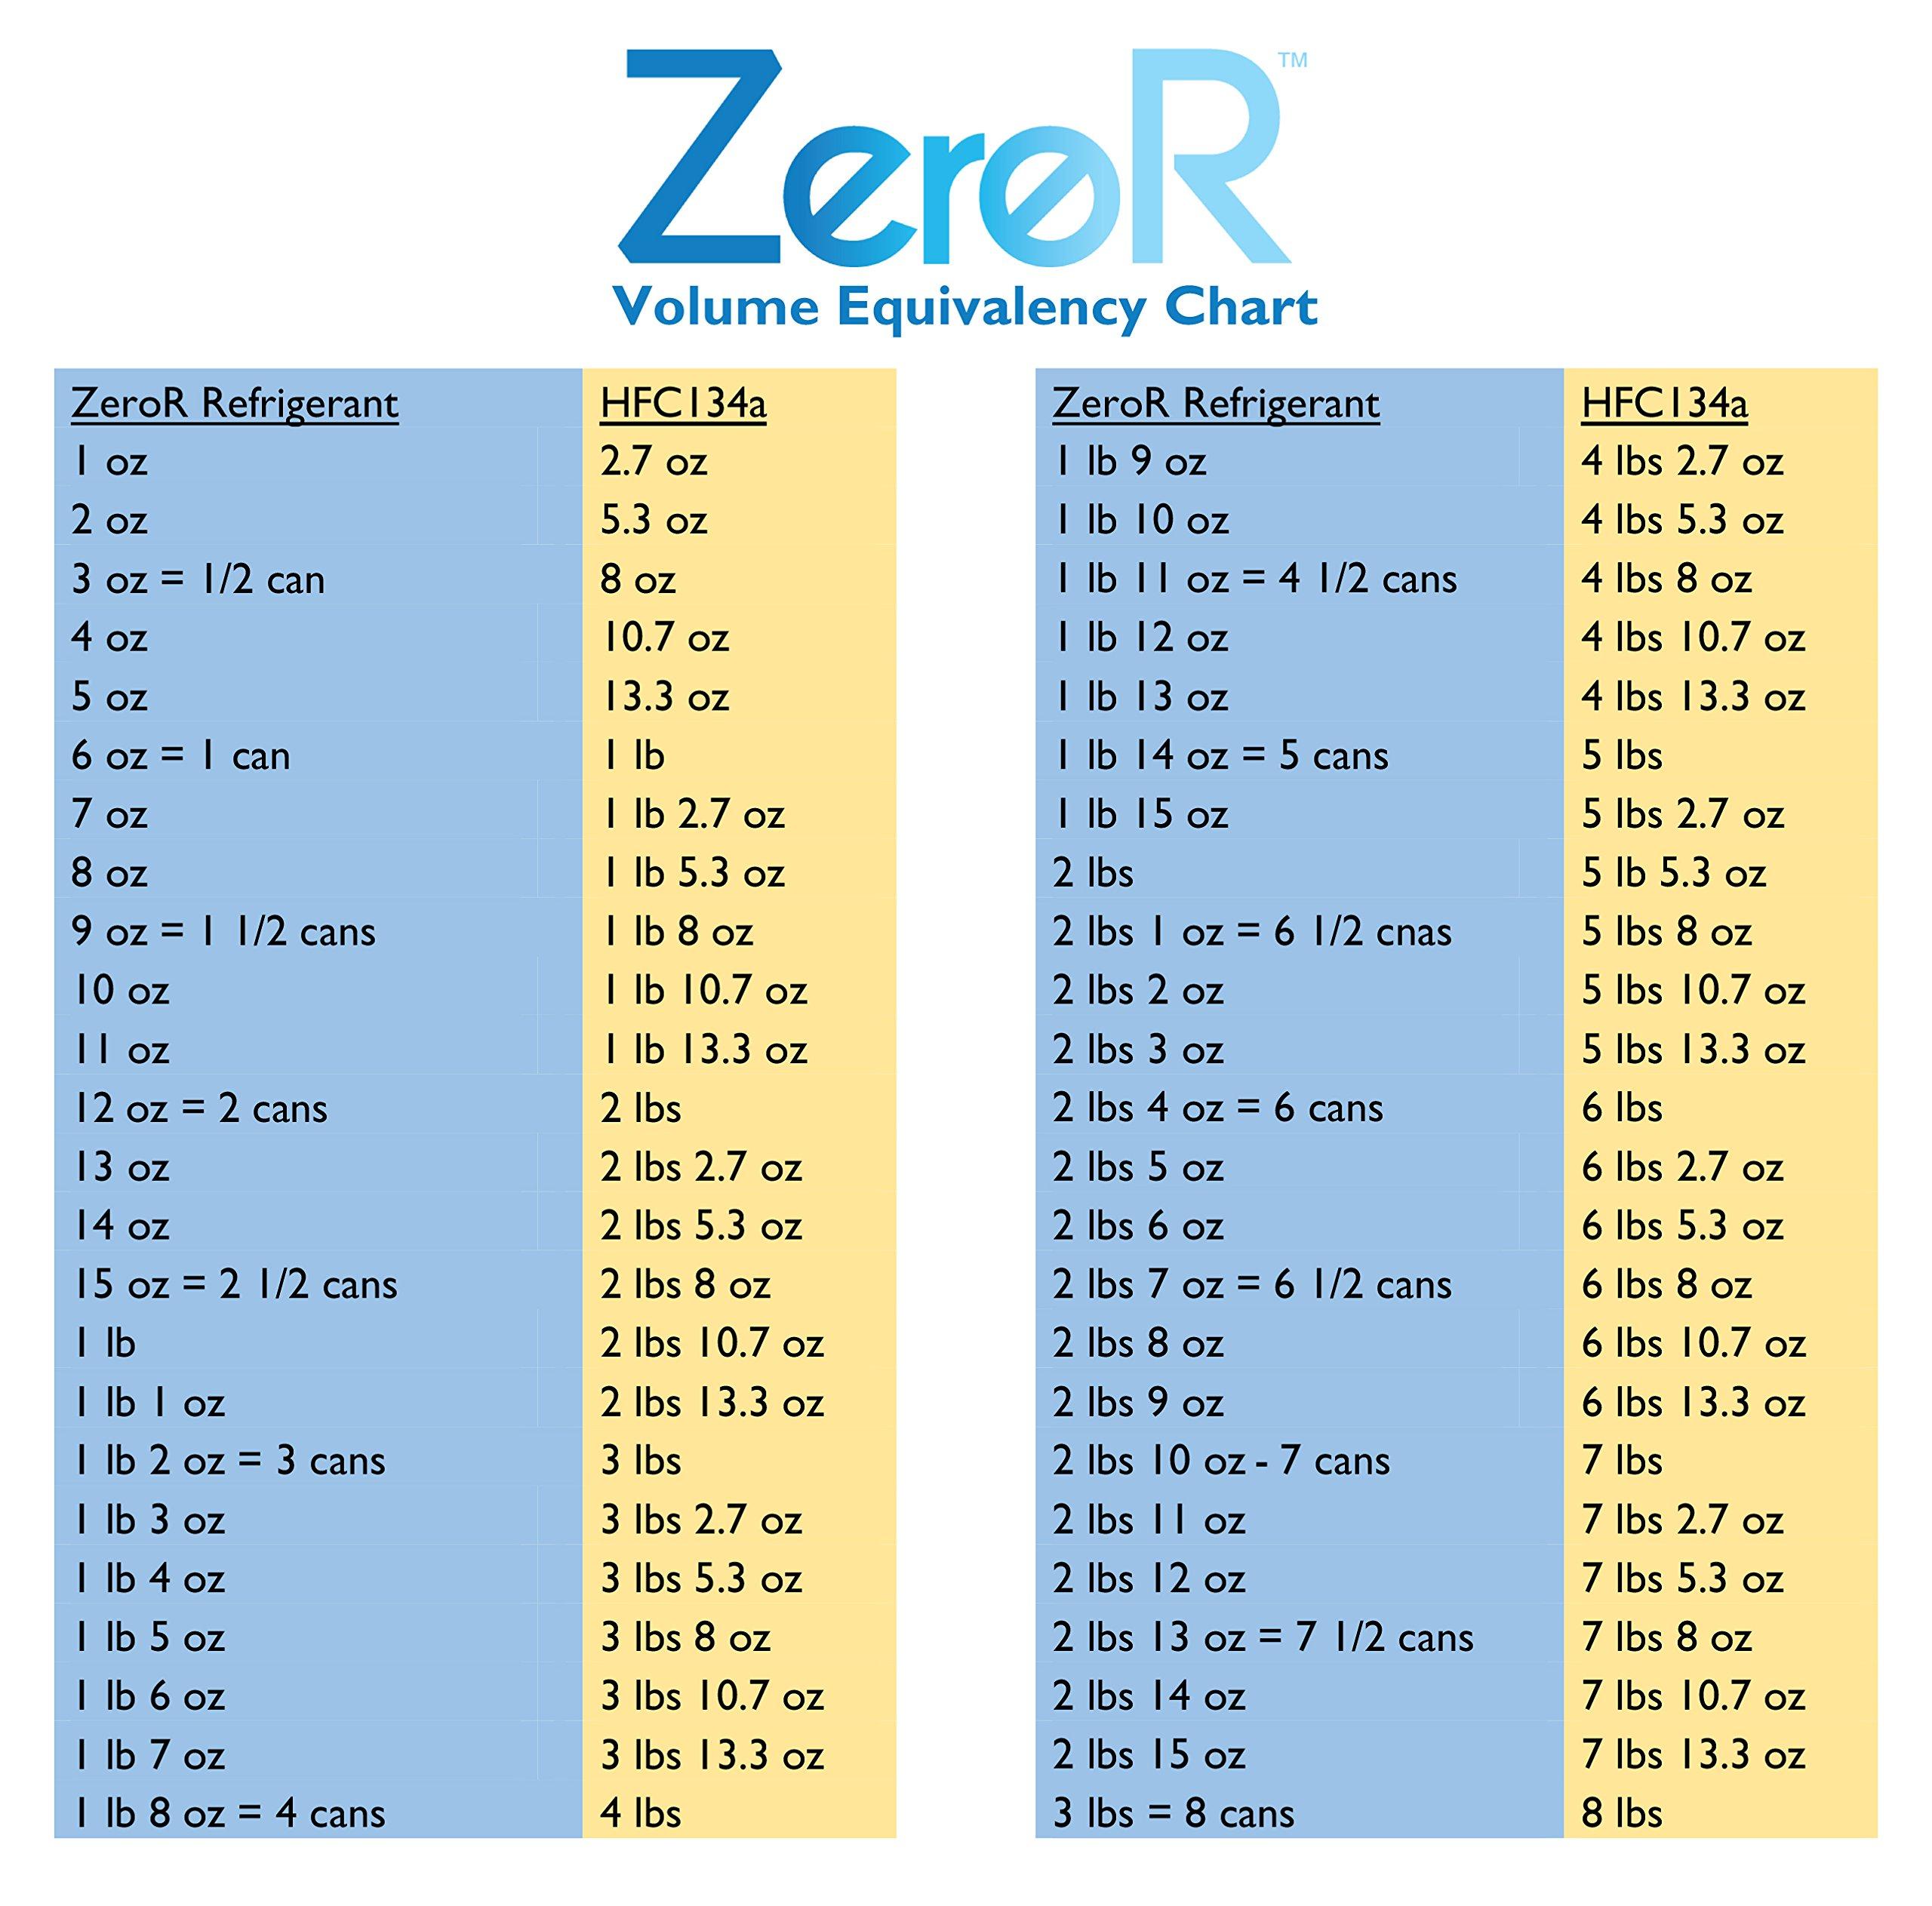 Zeror Ac Refrigerant 6 Cans Better Tha Buy Online In Cambodia At Desertcart